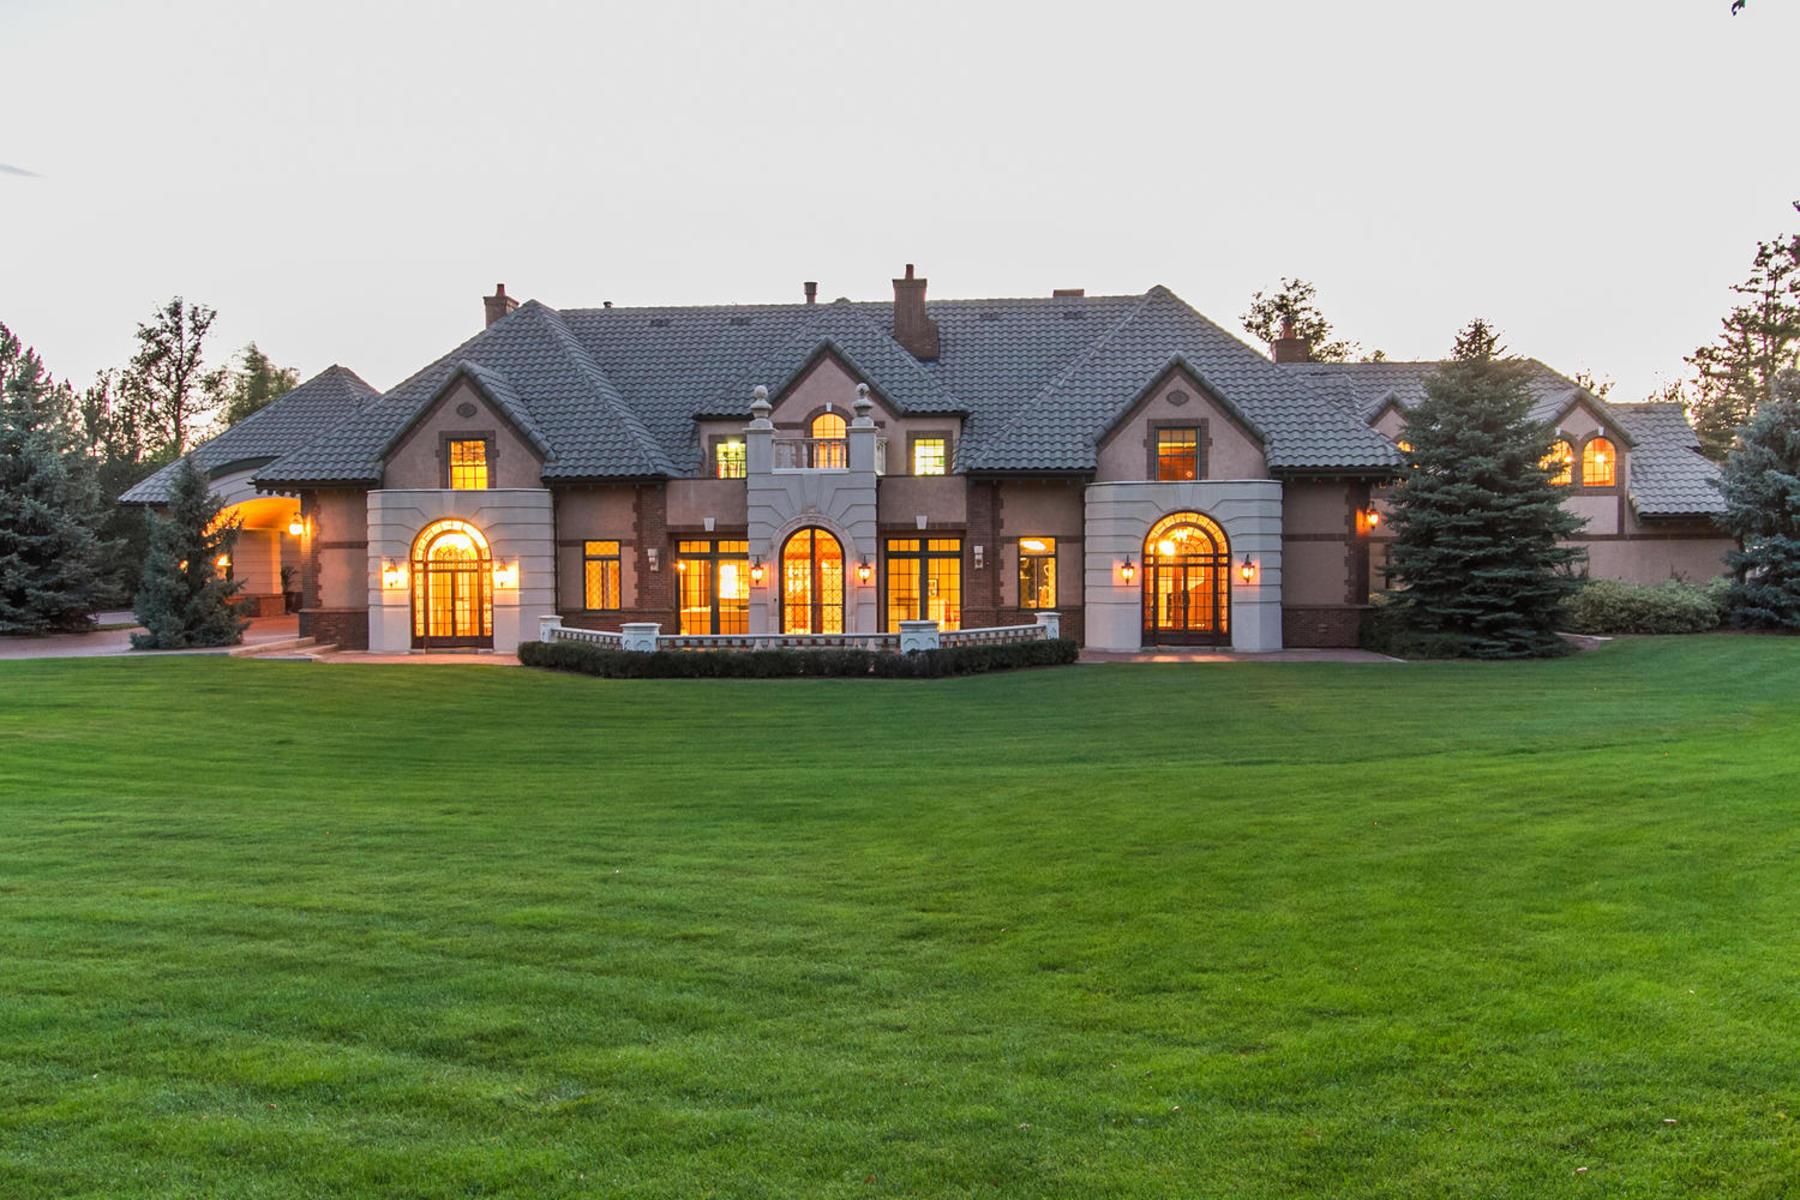 Single Family Home for Active at Extraordinary Estate on Pristine Acreage in Polo Club 530 S. University Boulevard Denver, Colorado 80209 United States